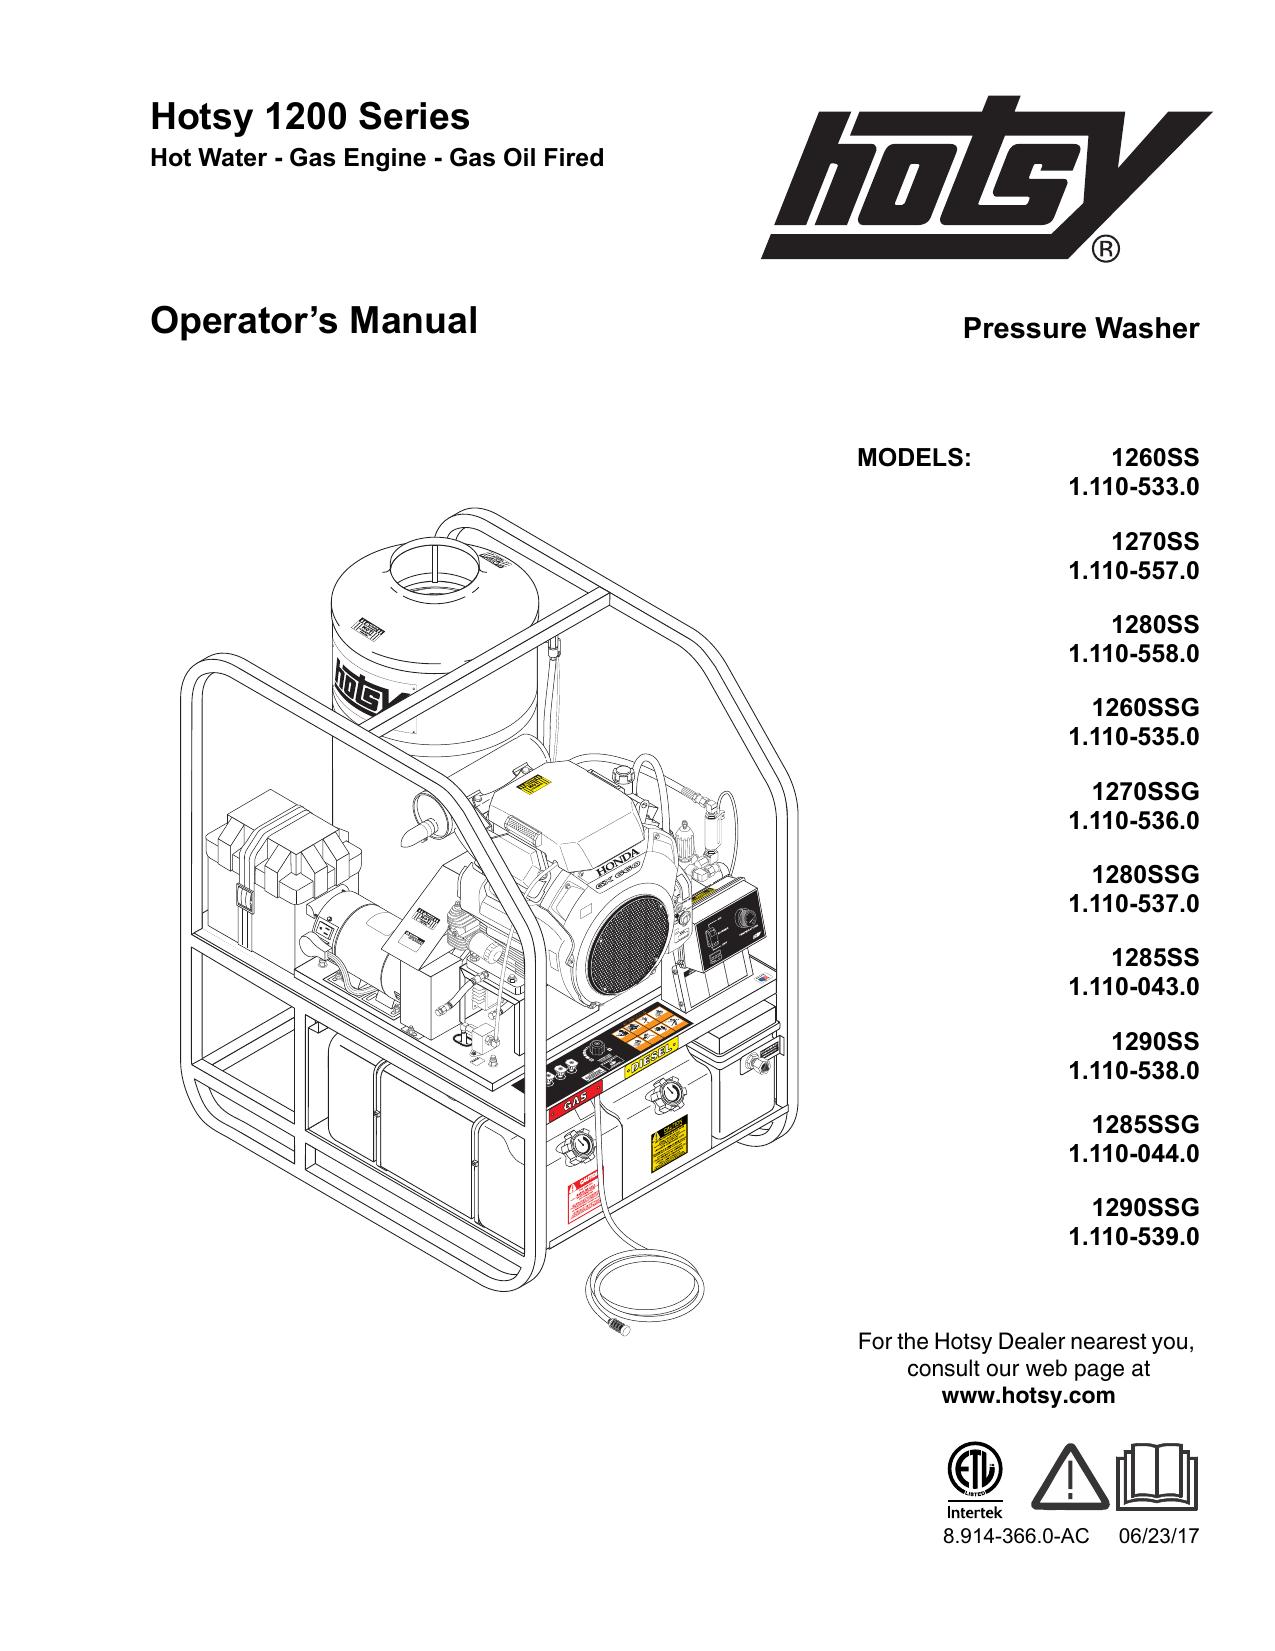 Hotsy Pressure Washer Wiring Diagram